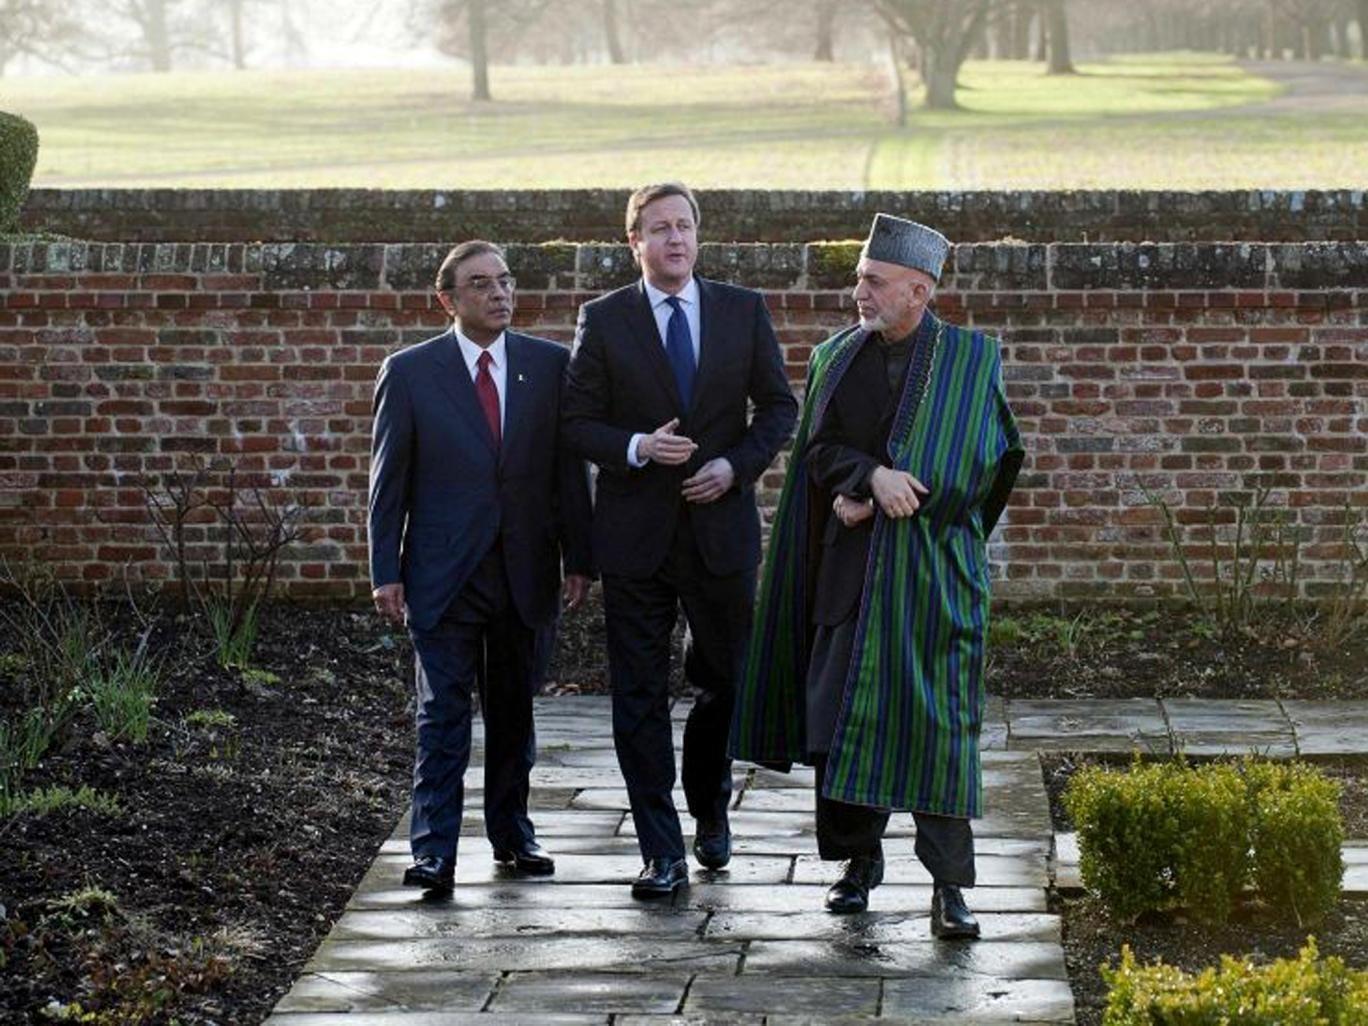 Asif Ali Zardari, David Cameron and Hamid Karzai at Chequers